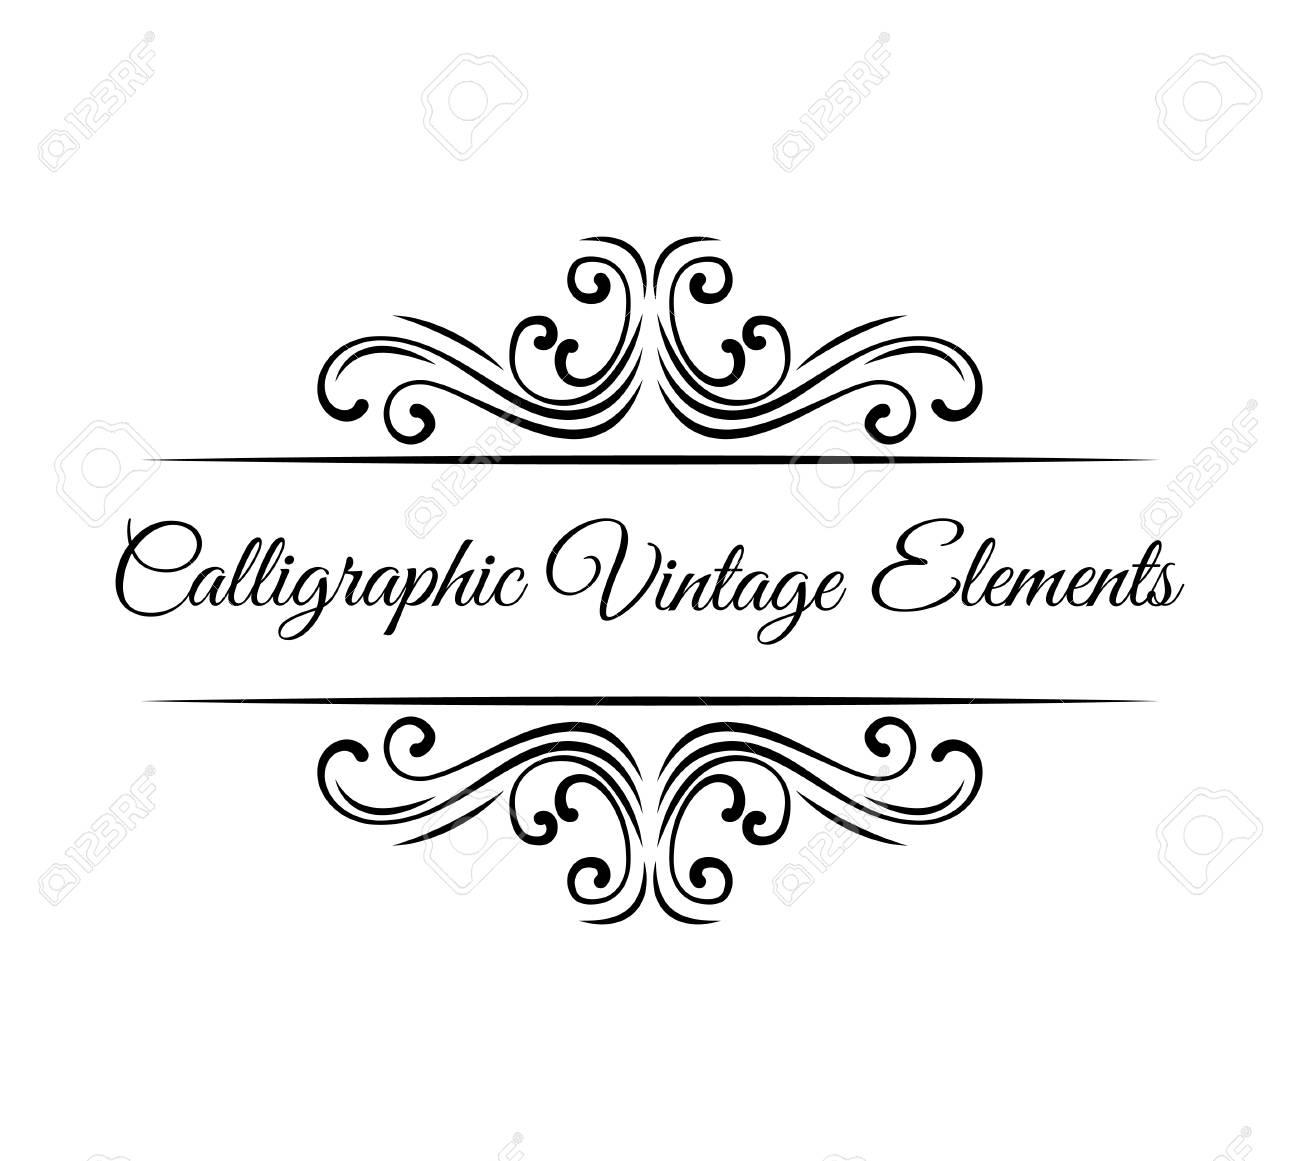 Calligraphic design elements. Vintage Vector Ornaments Decorations Design Elements. - 97592351